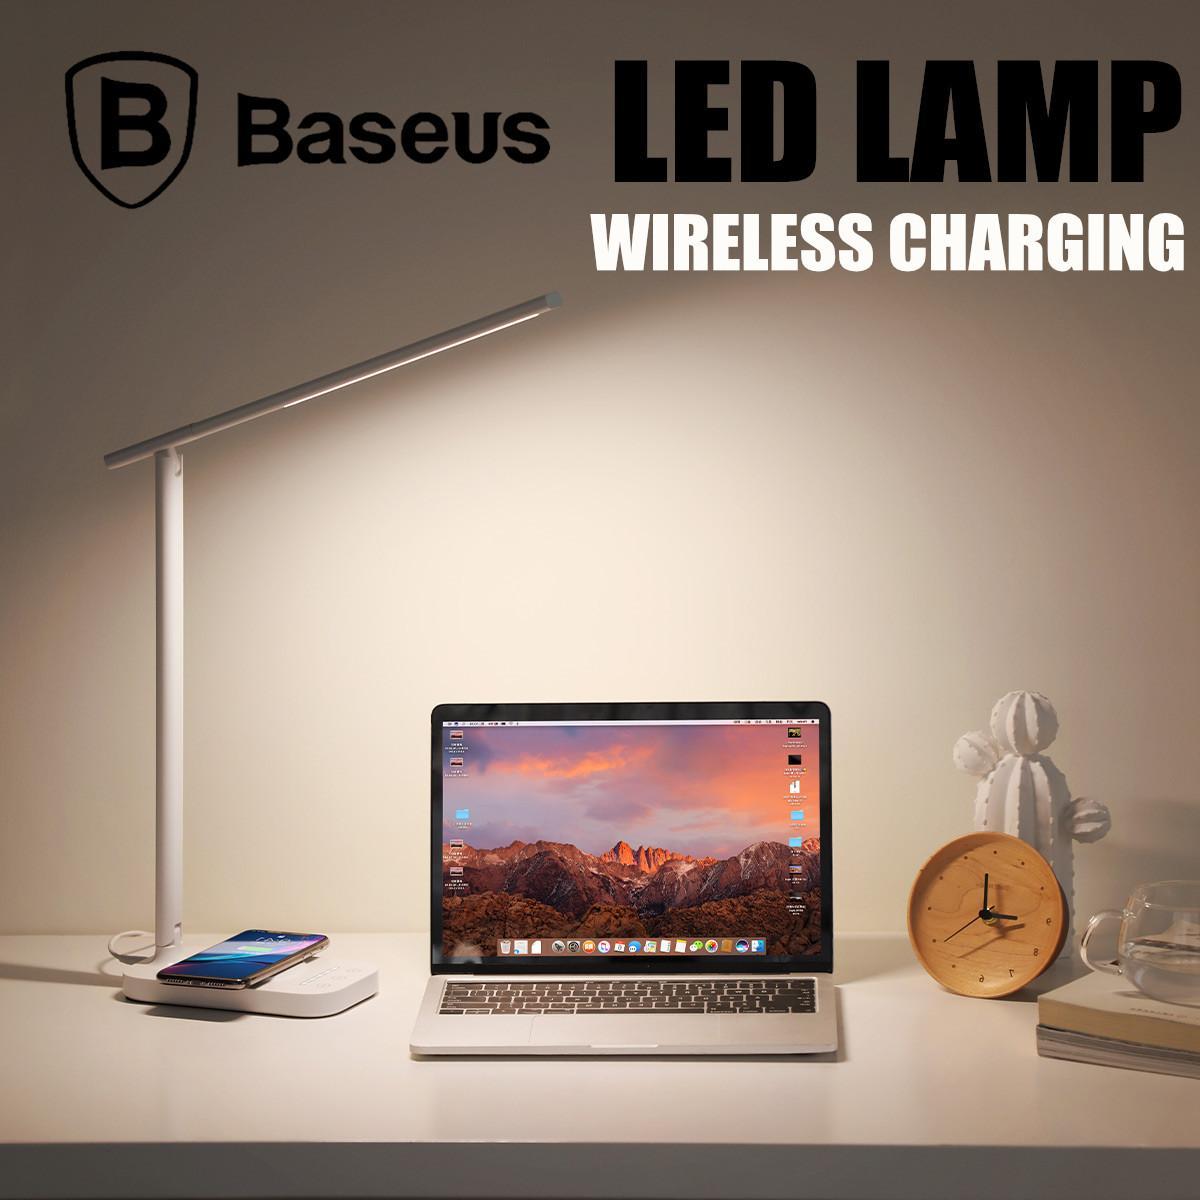 Baseus Lett LED Lamp Wireless Charging Foldable Desk LED Table Lamp 3 Light Mode 5 Brightness Level EU Plug / White